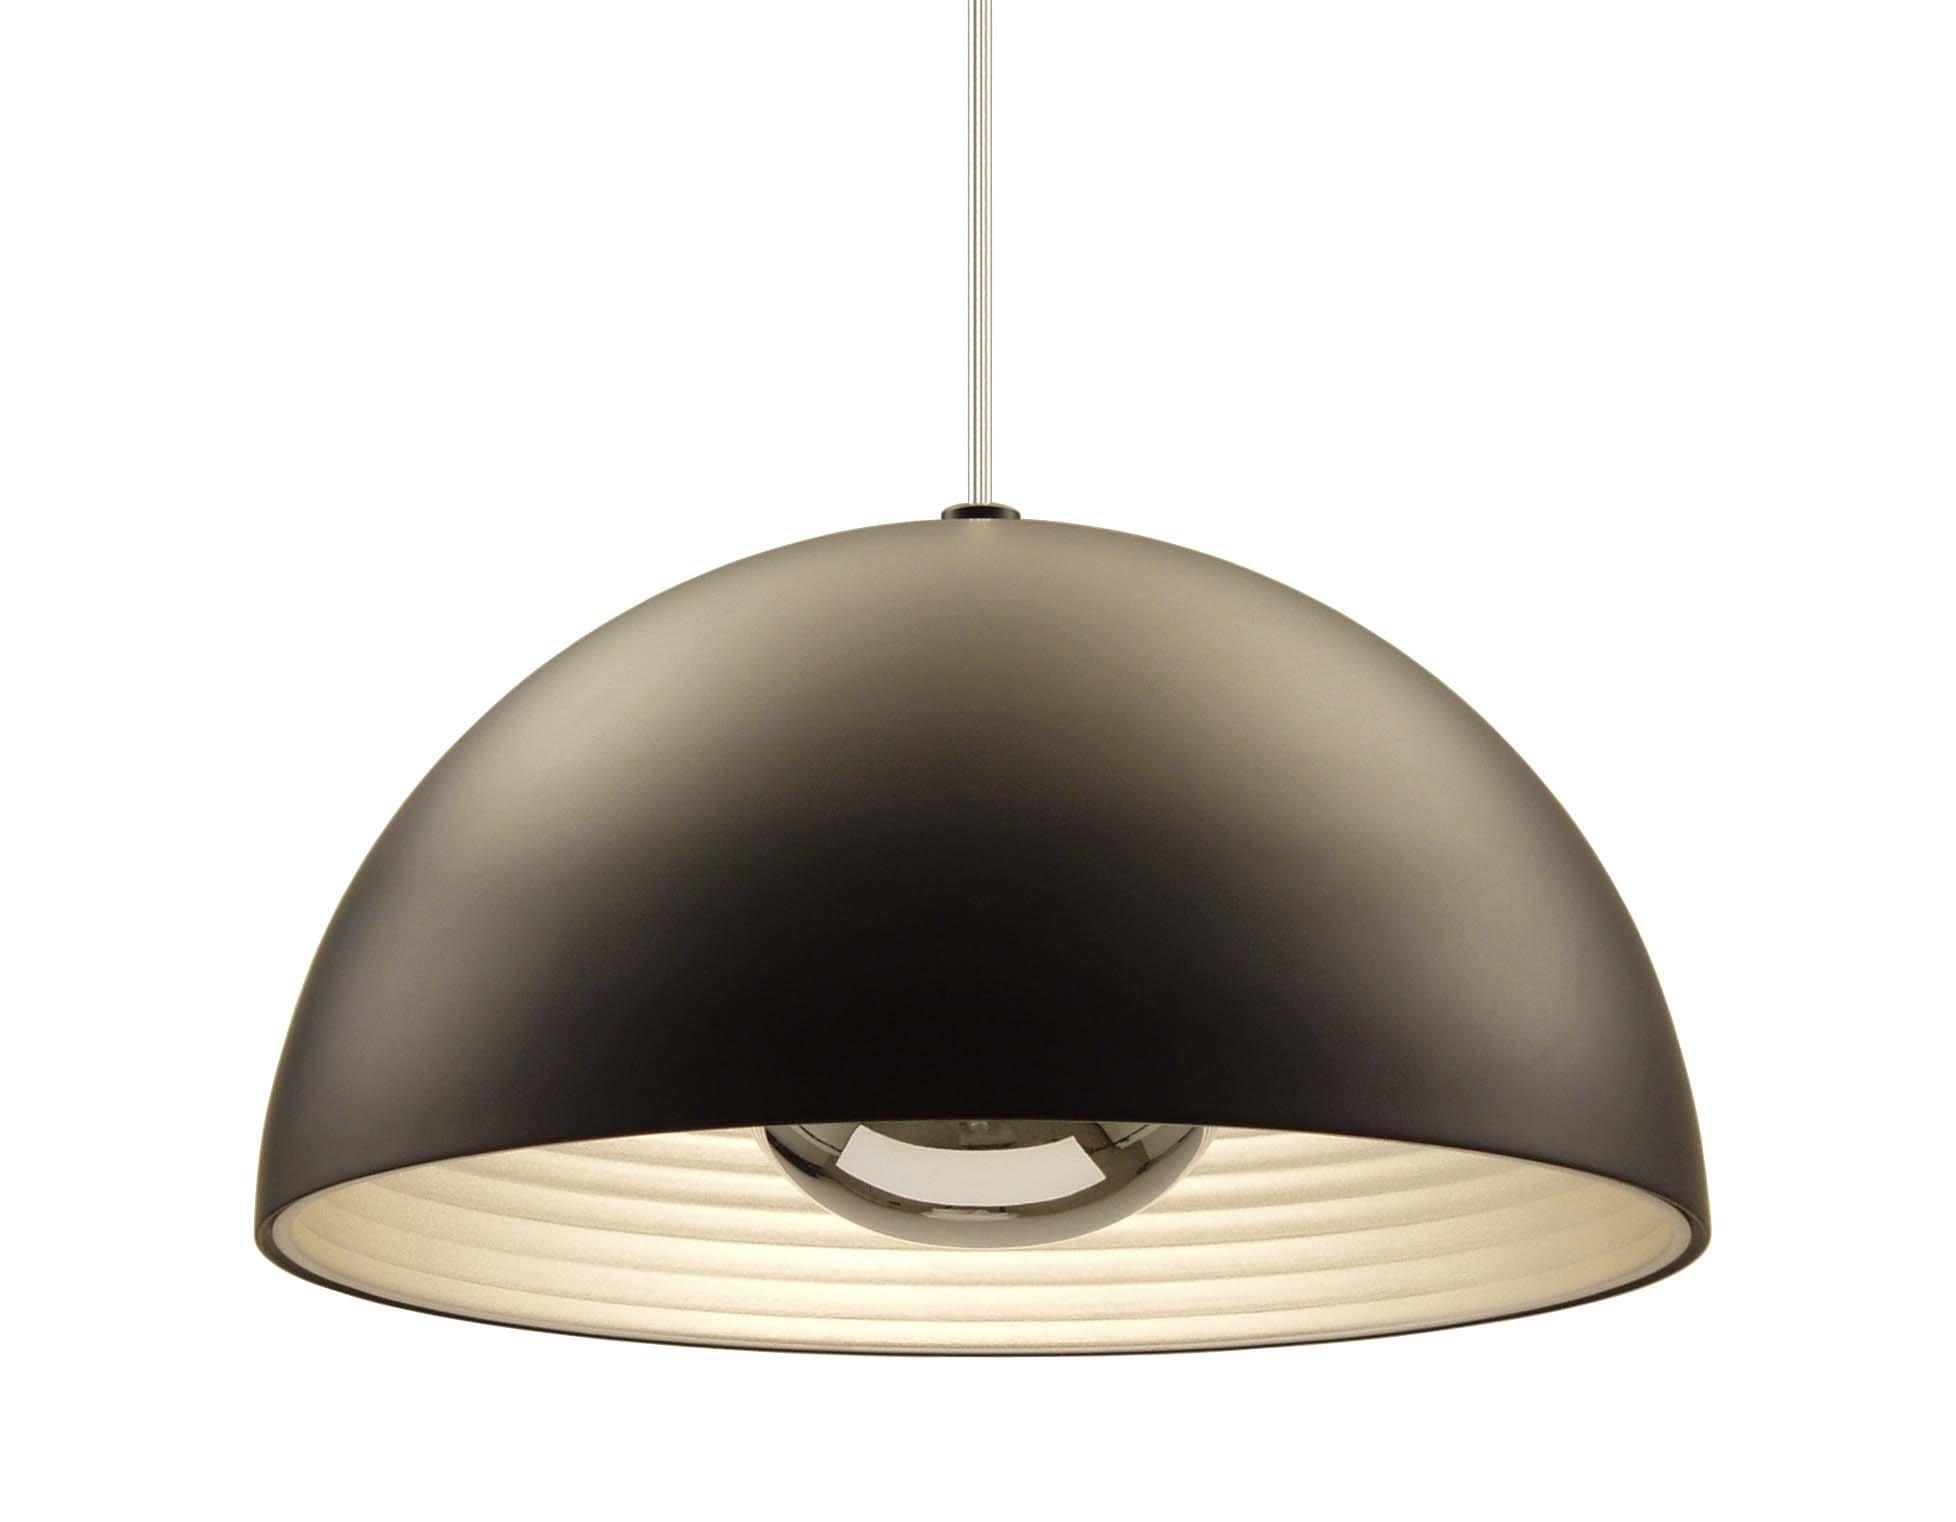 Seed Design USA Dome Pendant, Medium, Black